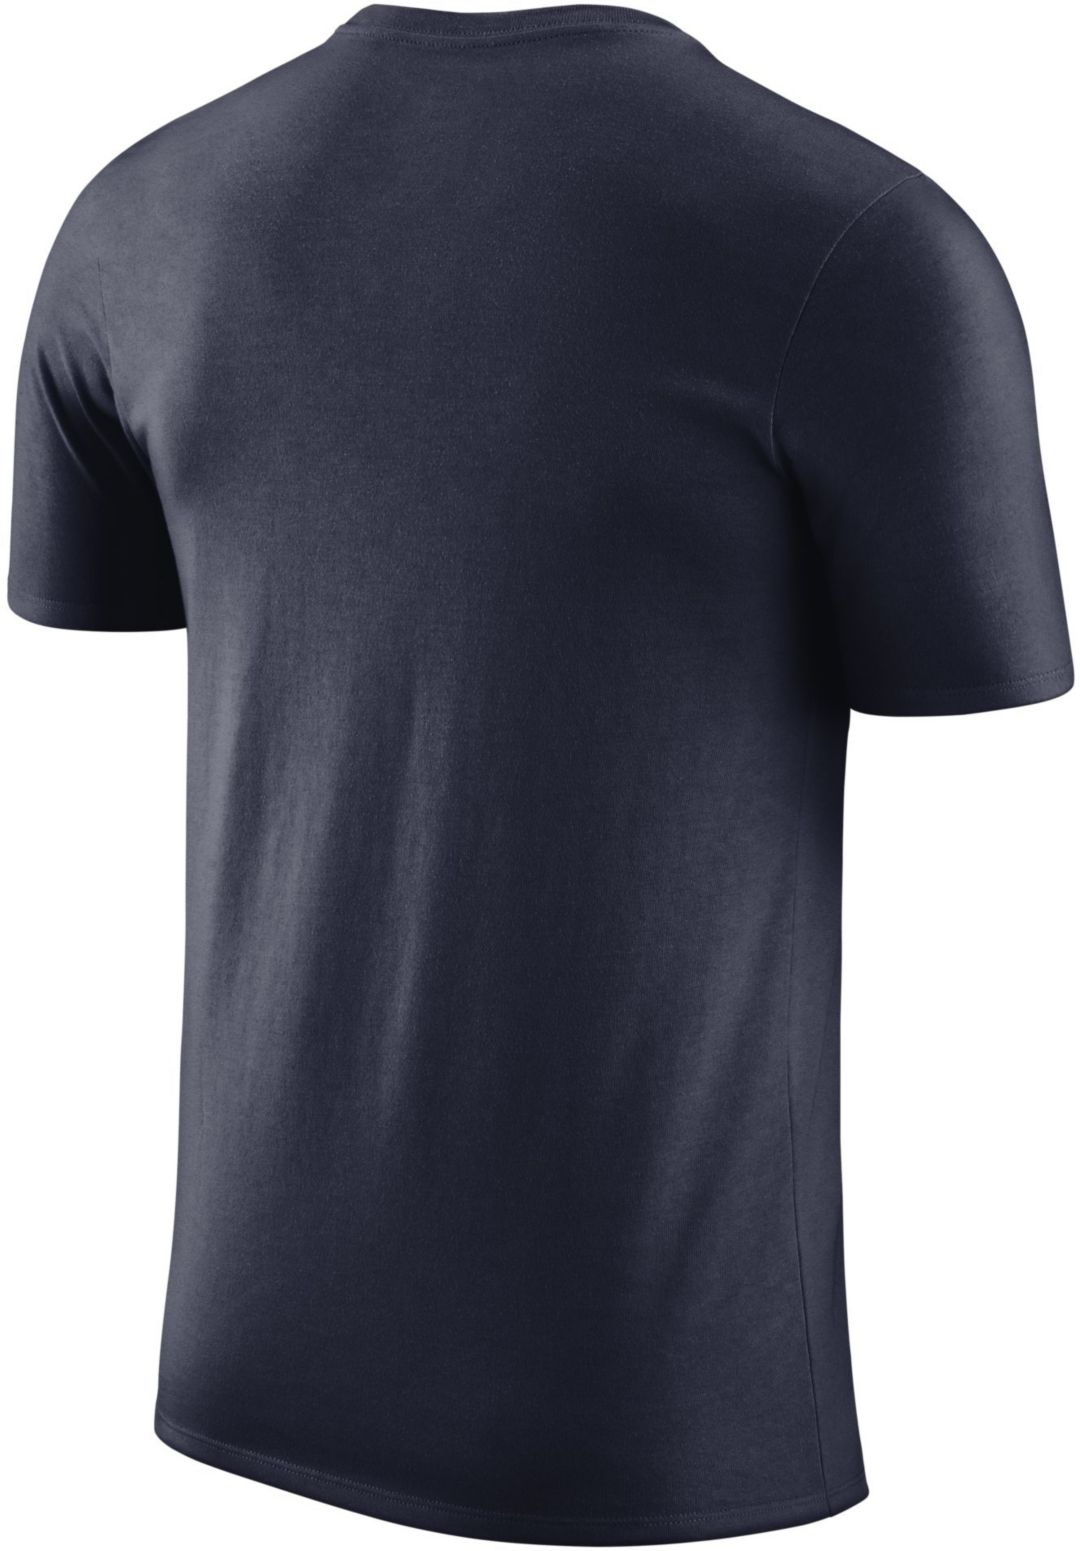 the latest 3467d f5251 Nike Men's New York Yankees Practice T-Shirt